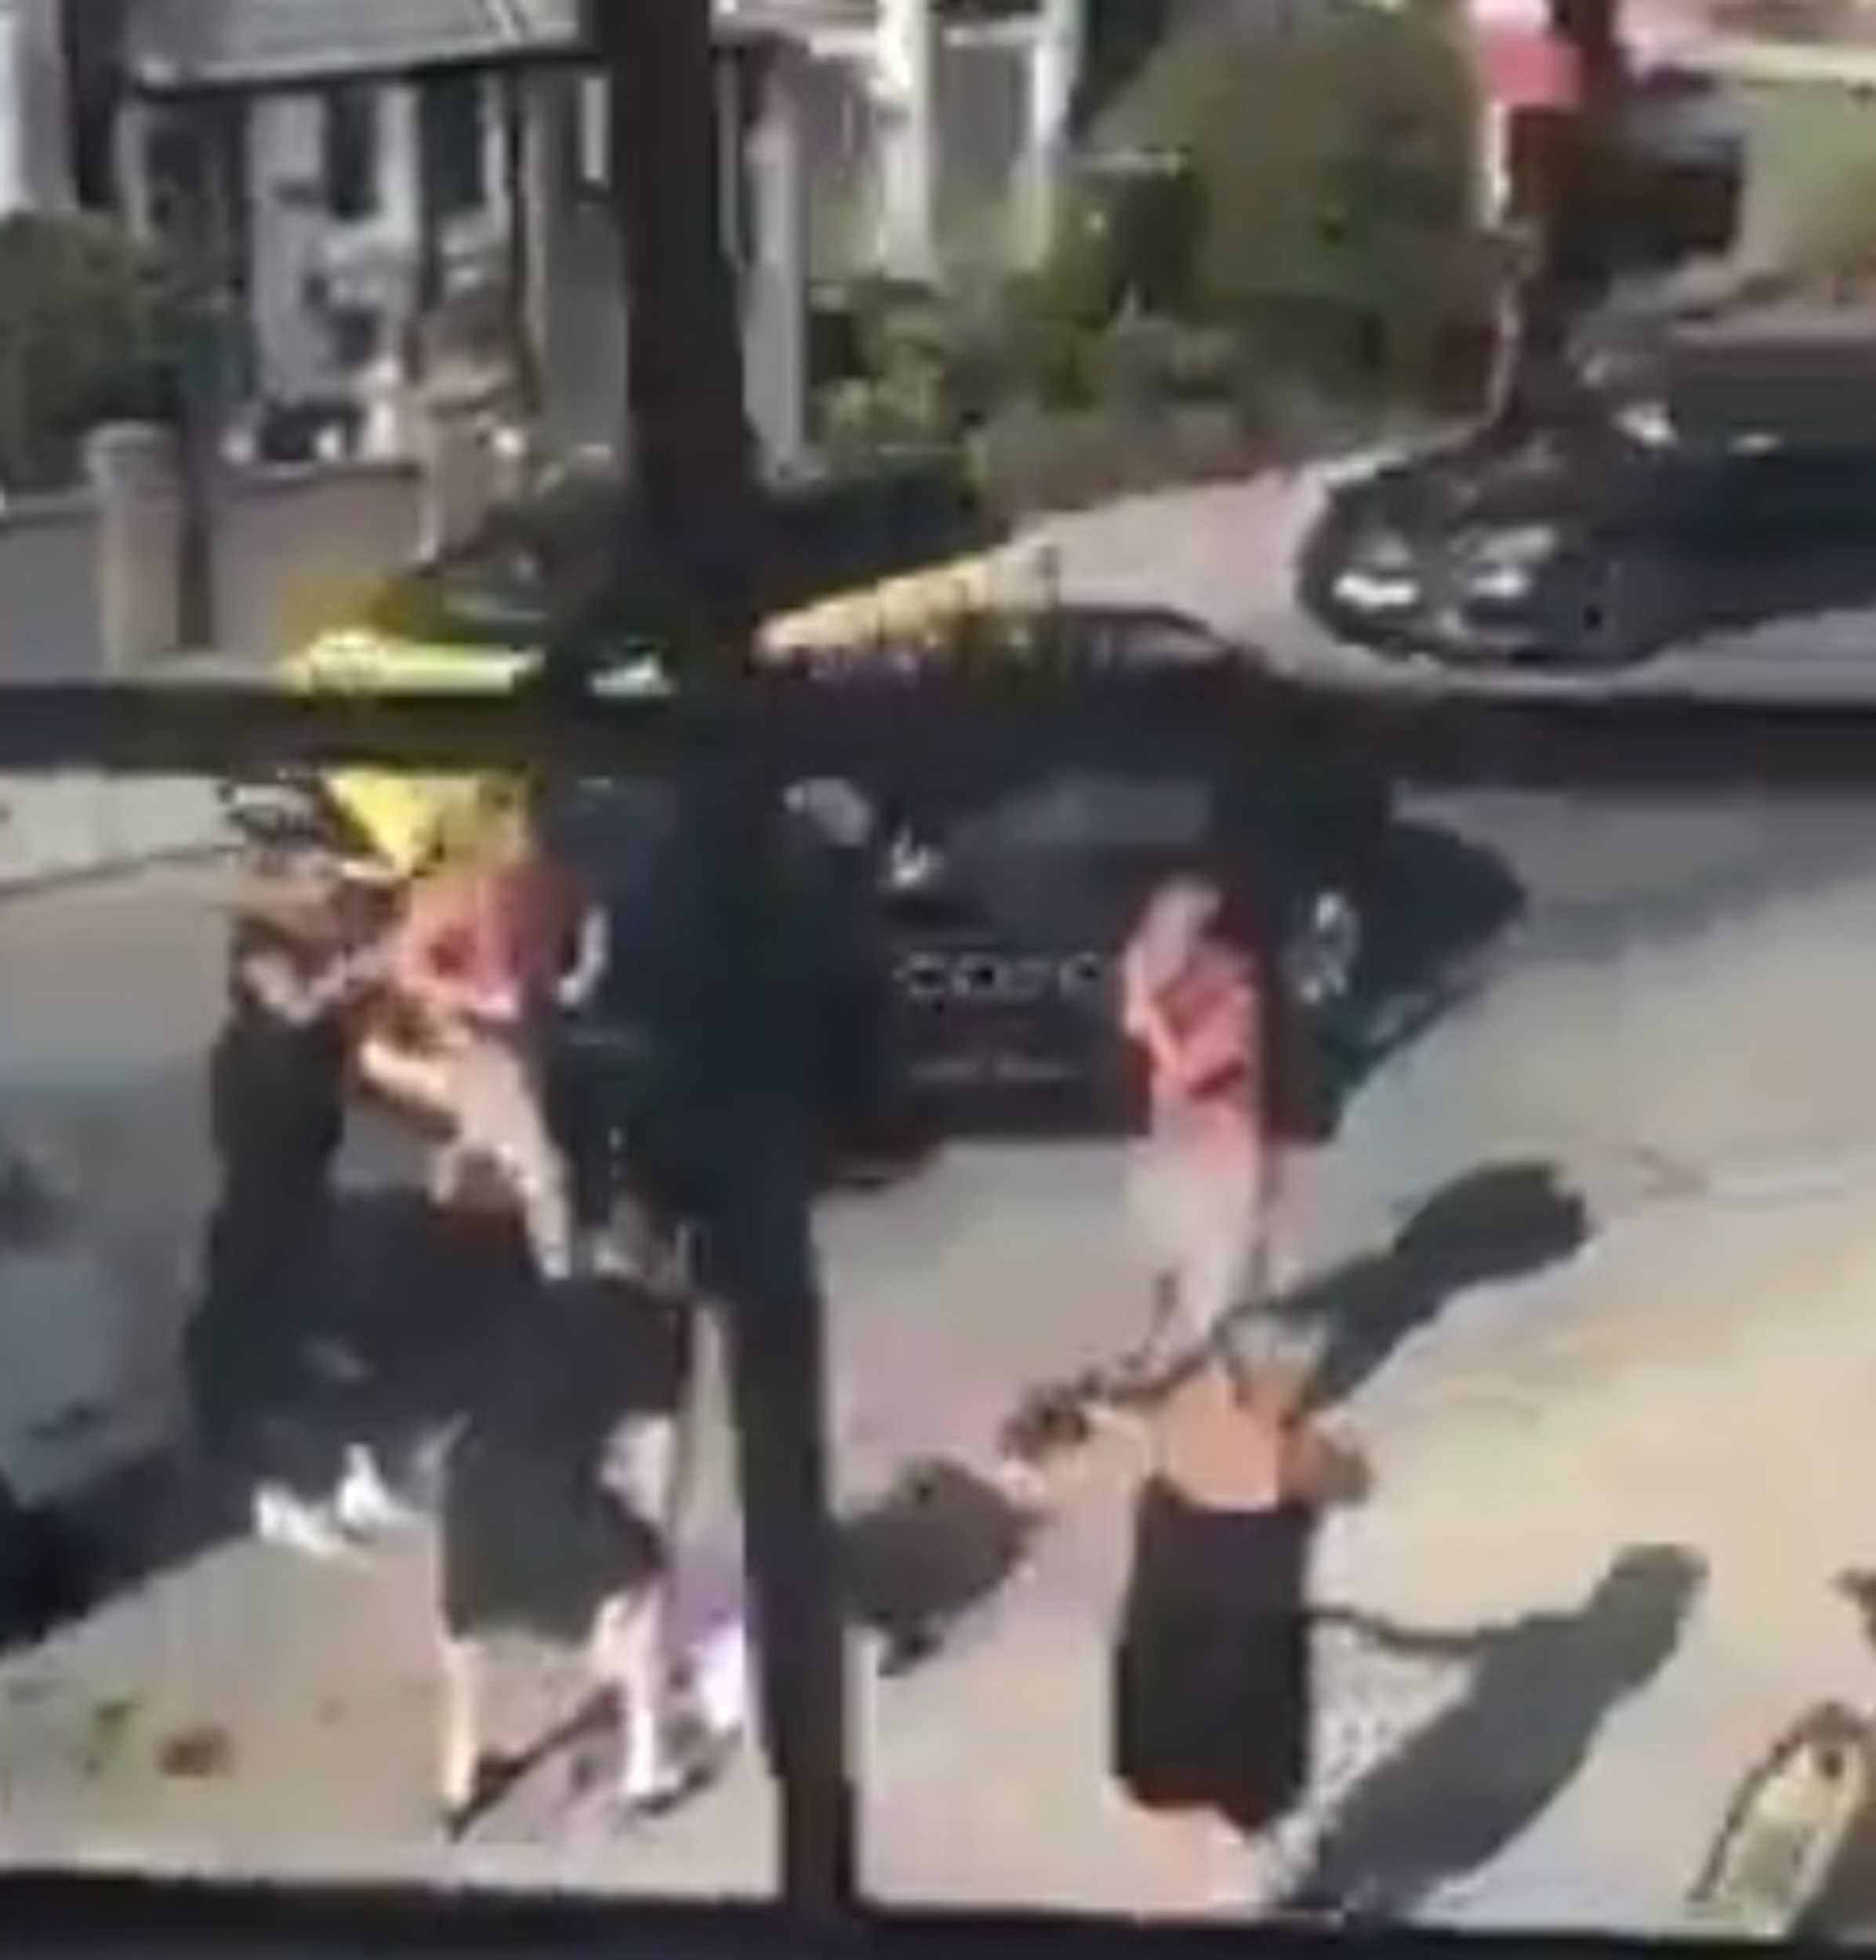 Shocked crowd gathers- Viral VIdeo News